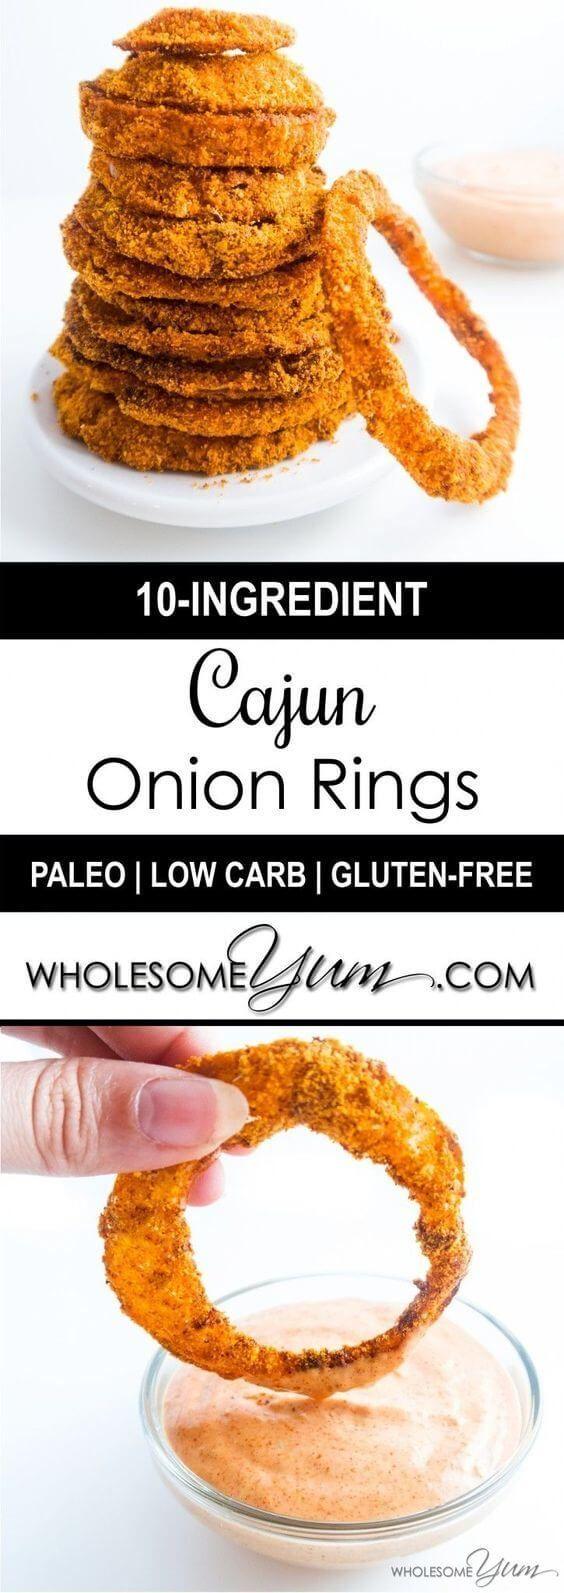 Gluten-Free Cajun Onion Rings Recipe